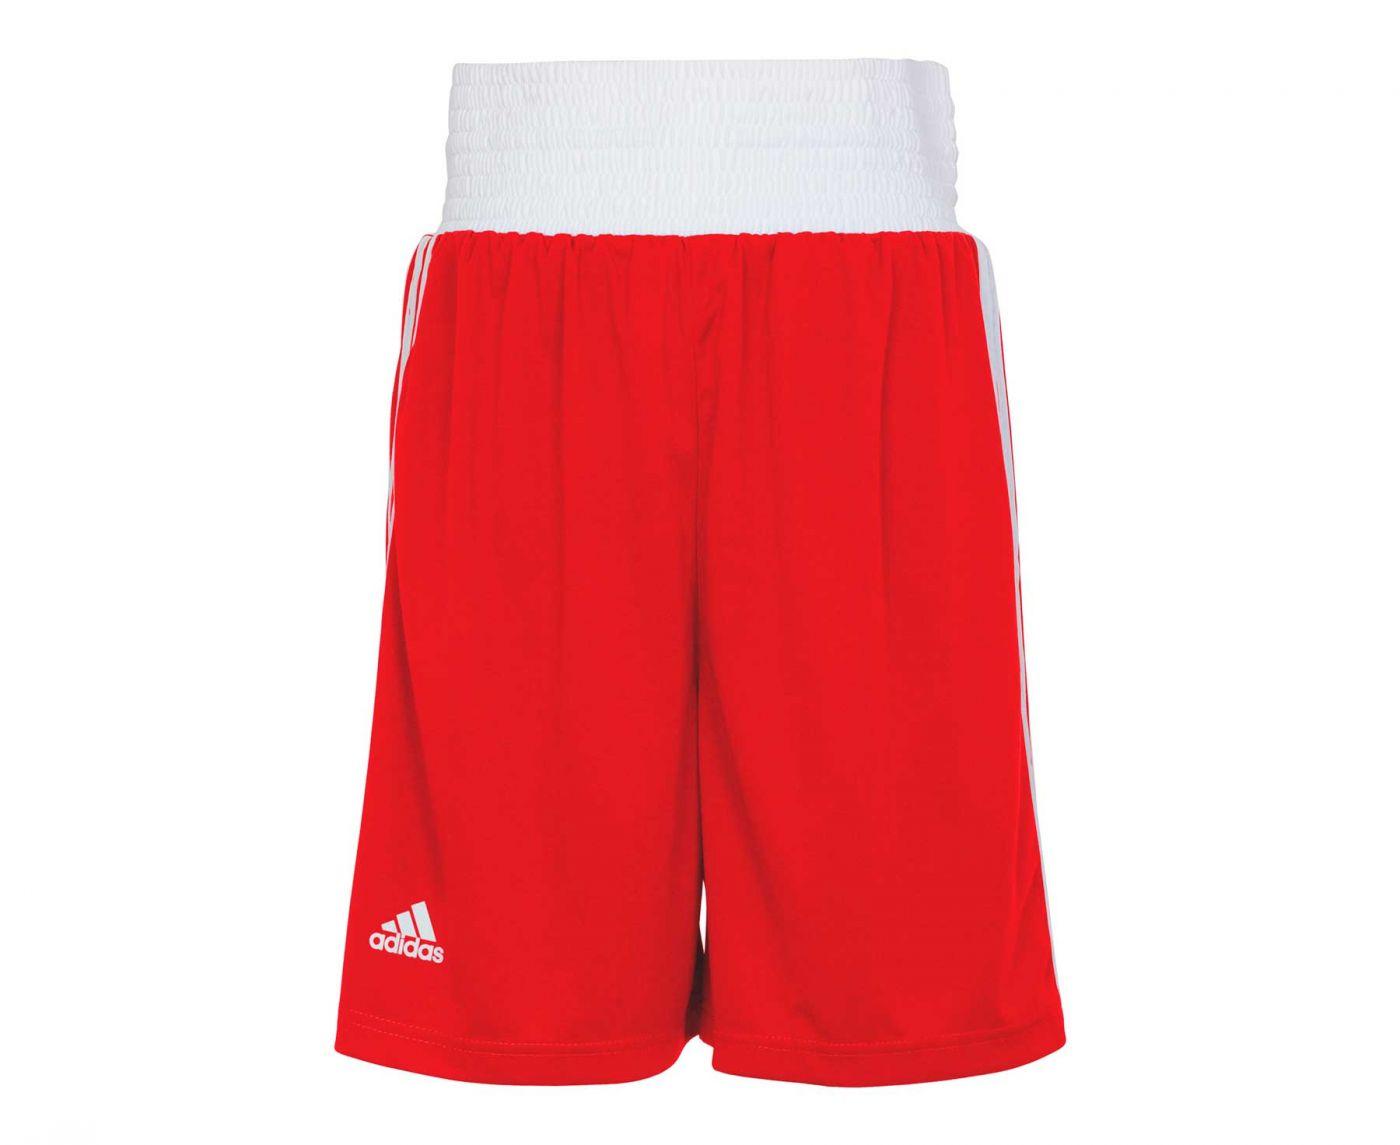 Шорты боксерские Adidas Boxing Short Punch Line красные, артикул adiBTS02